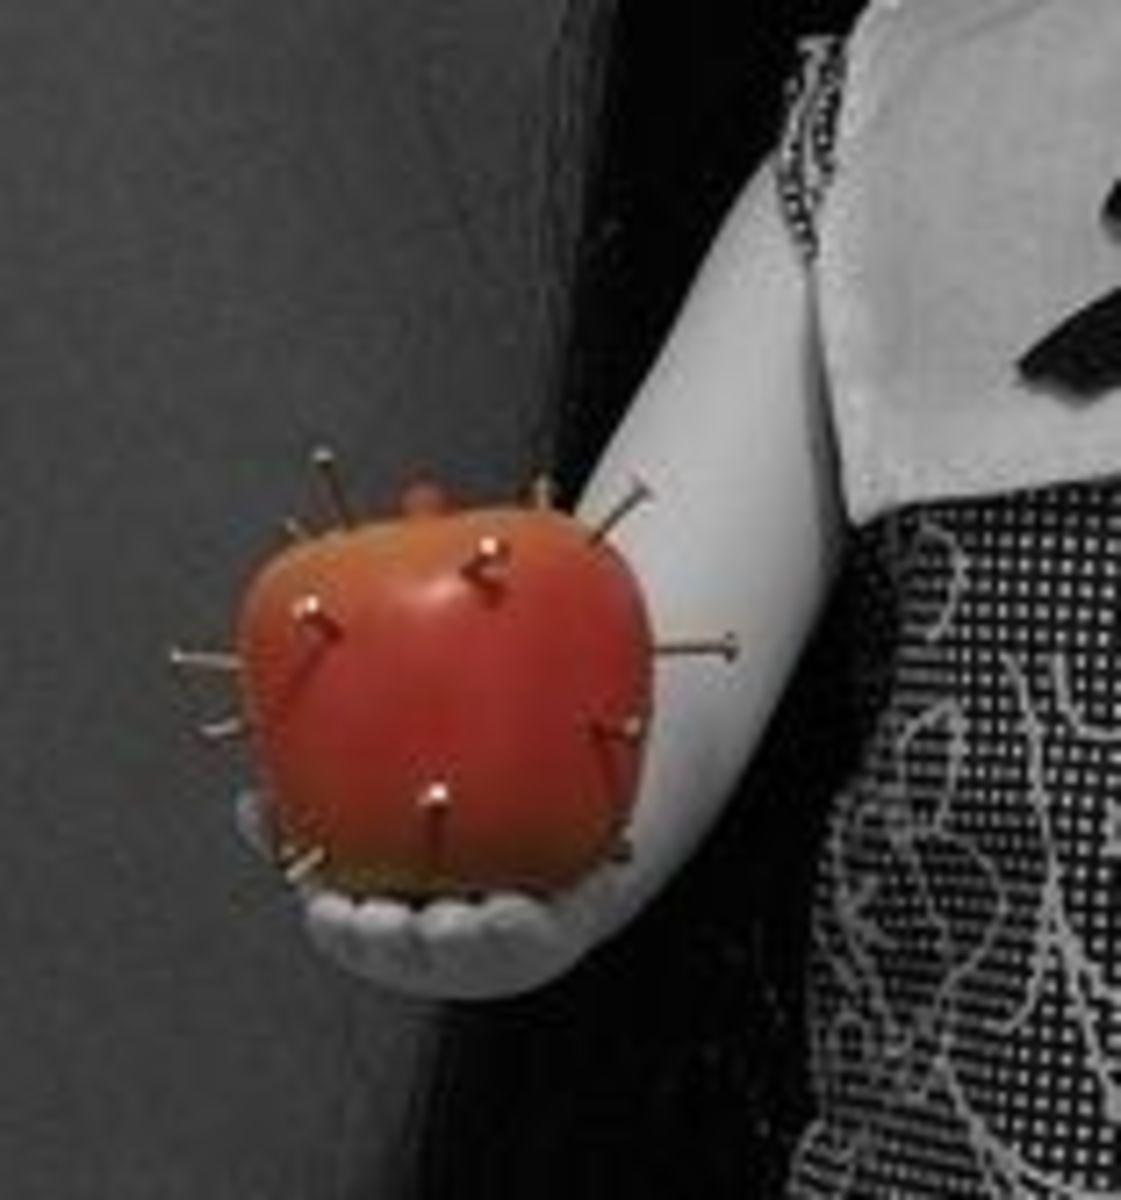 Little Apple Red